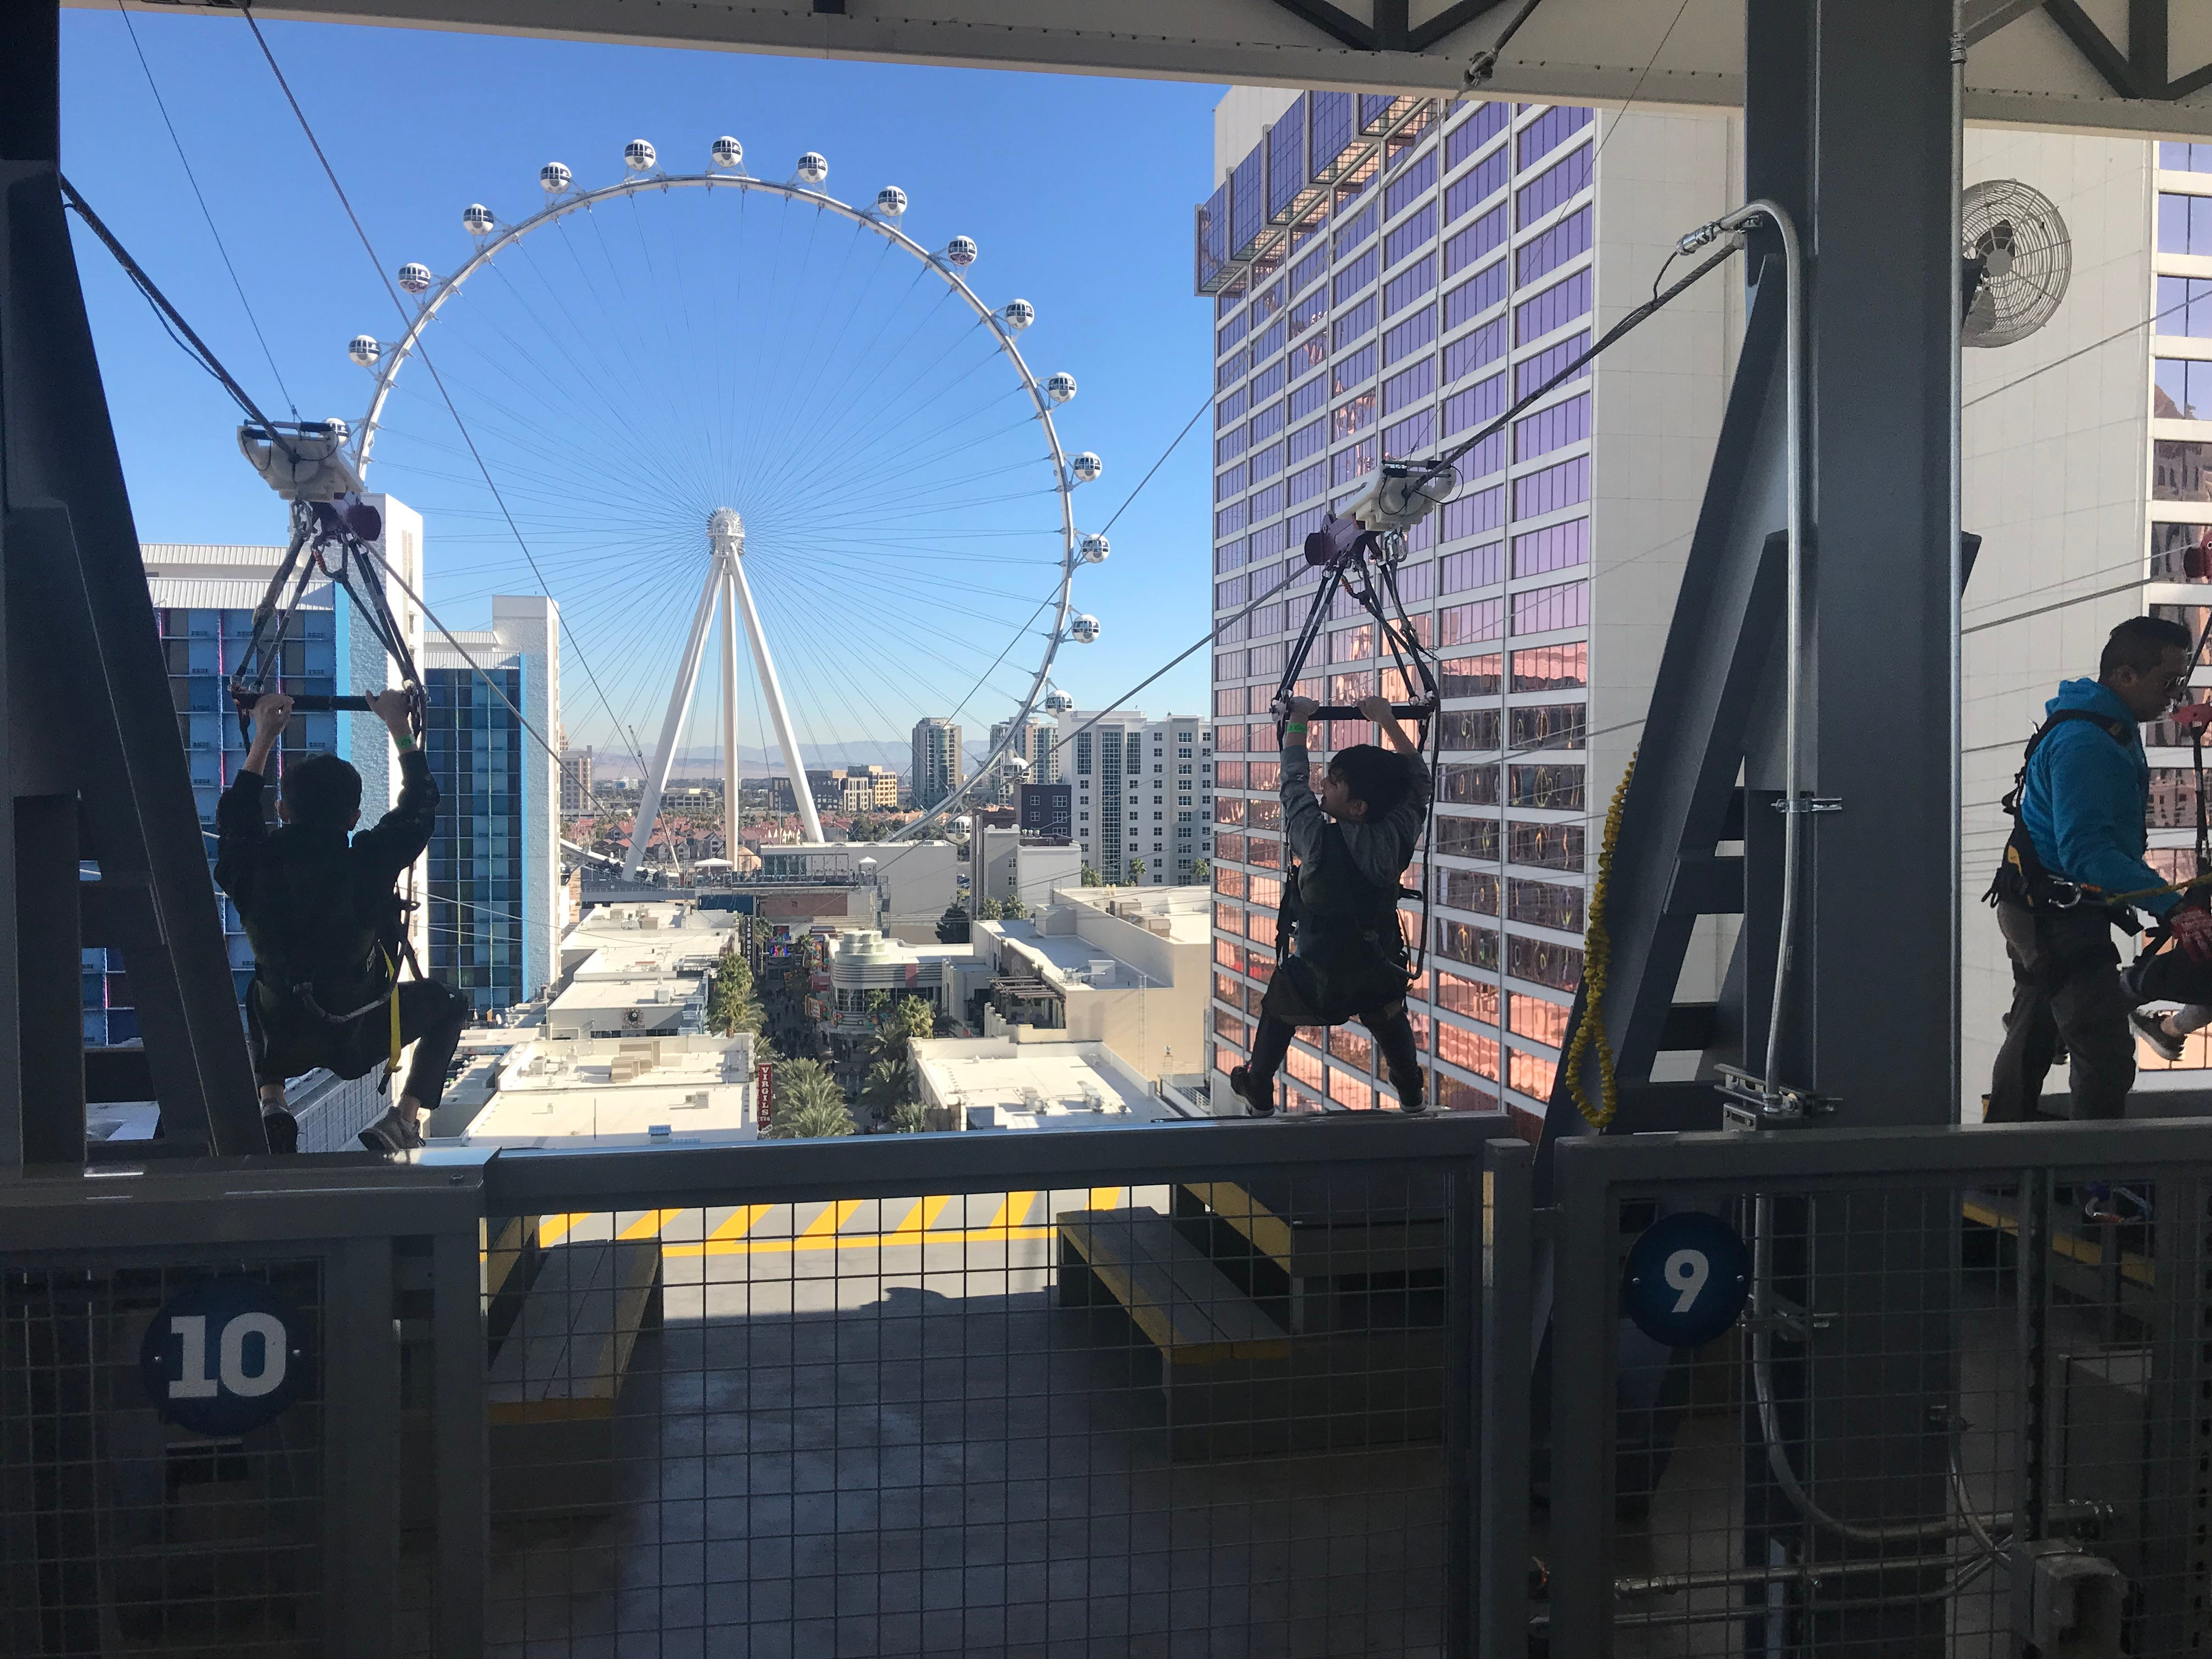 The Fly Linq zipline opened on the Linq promenade in Las Vegas in November 2018.